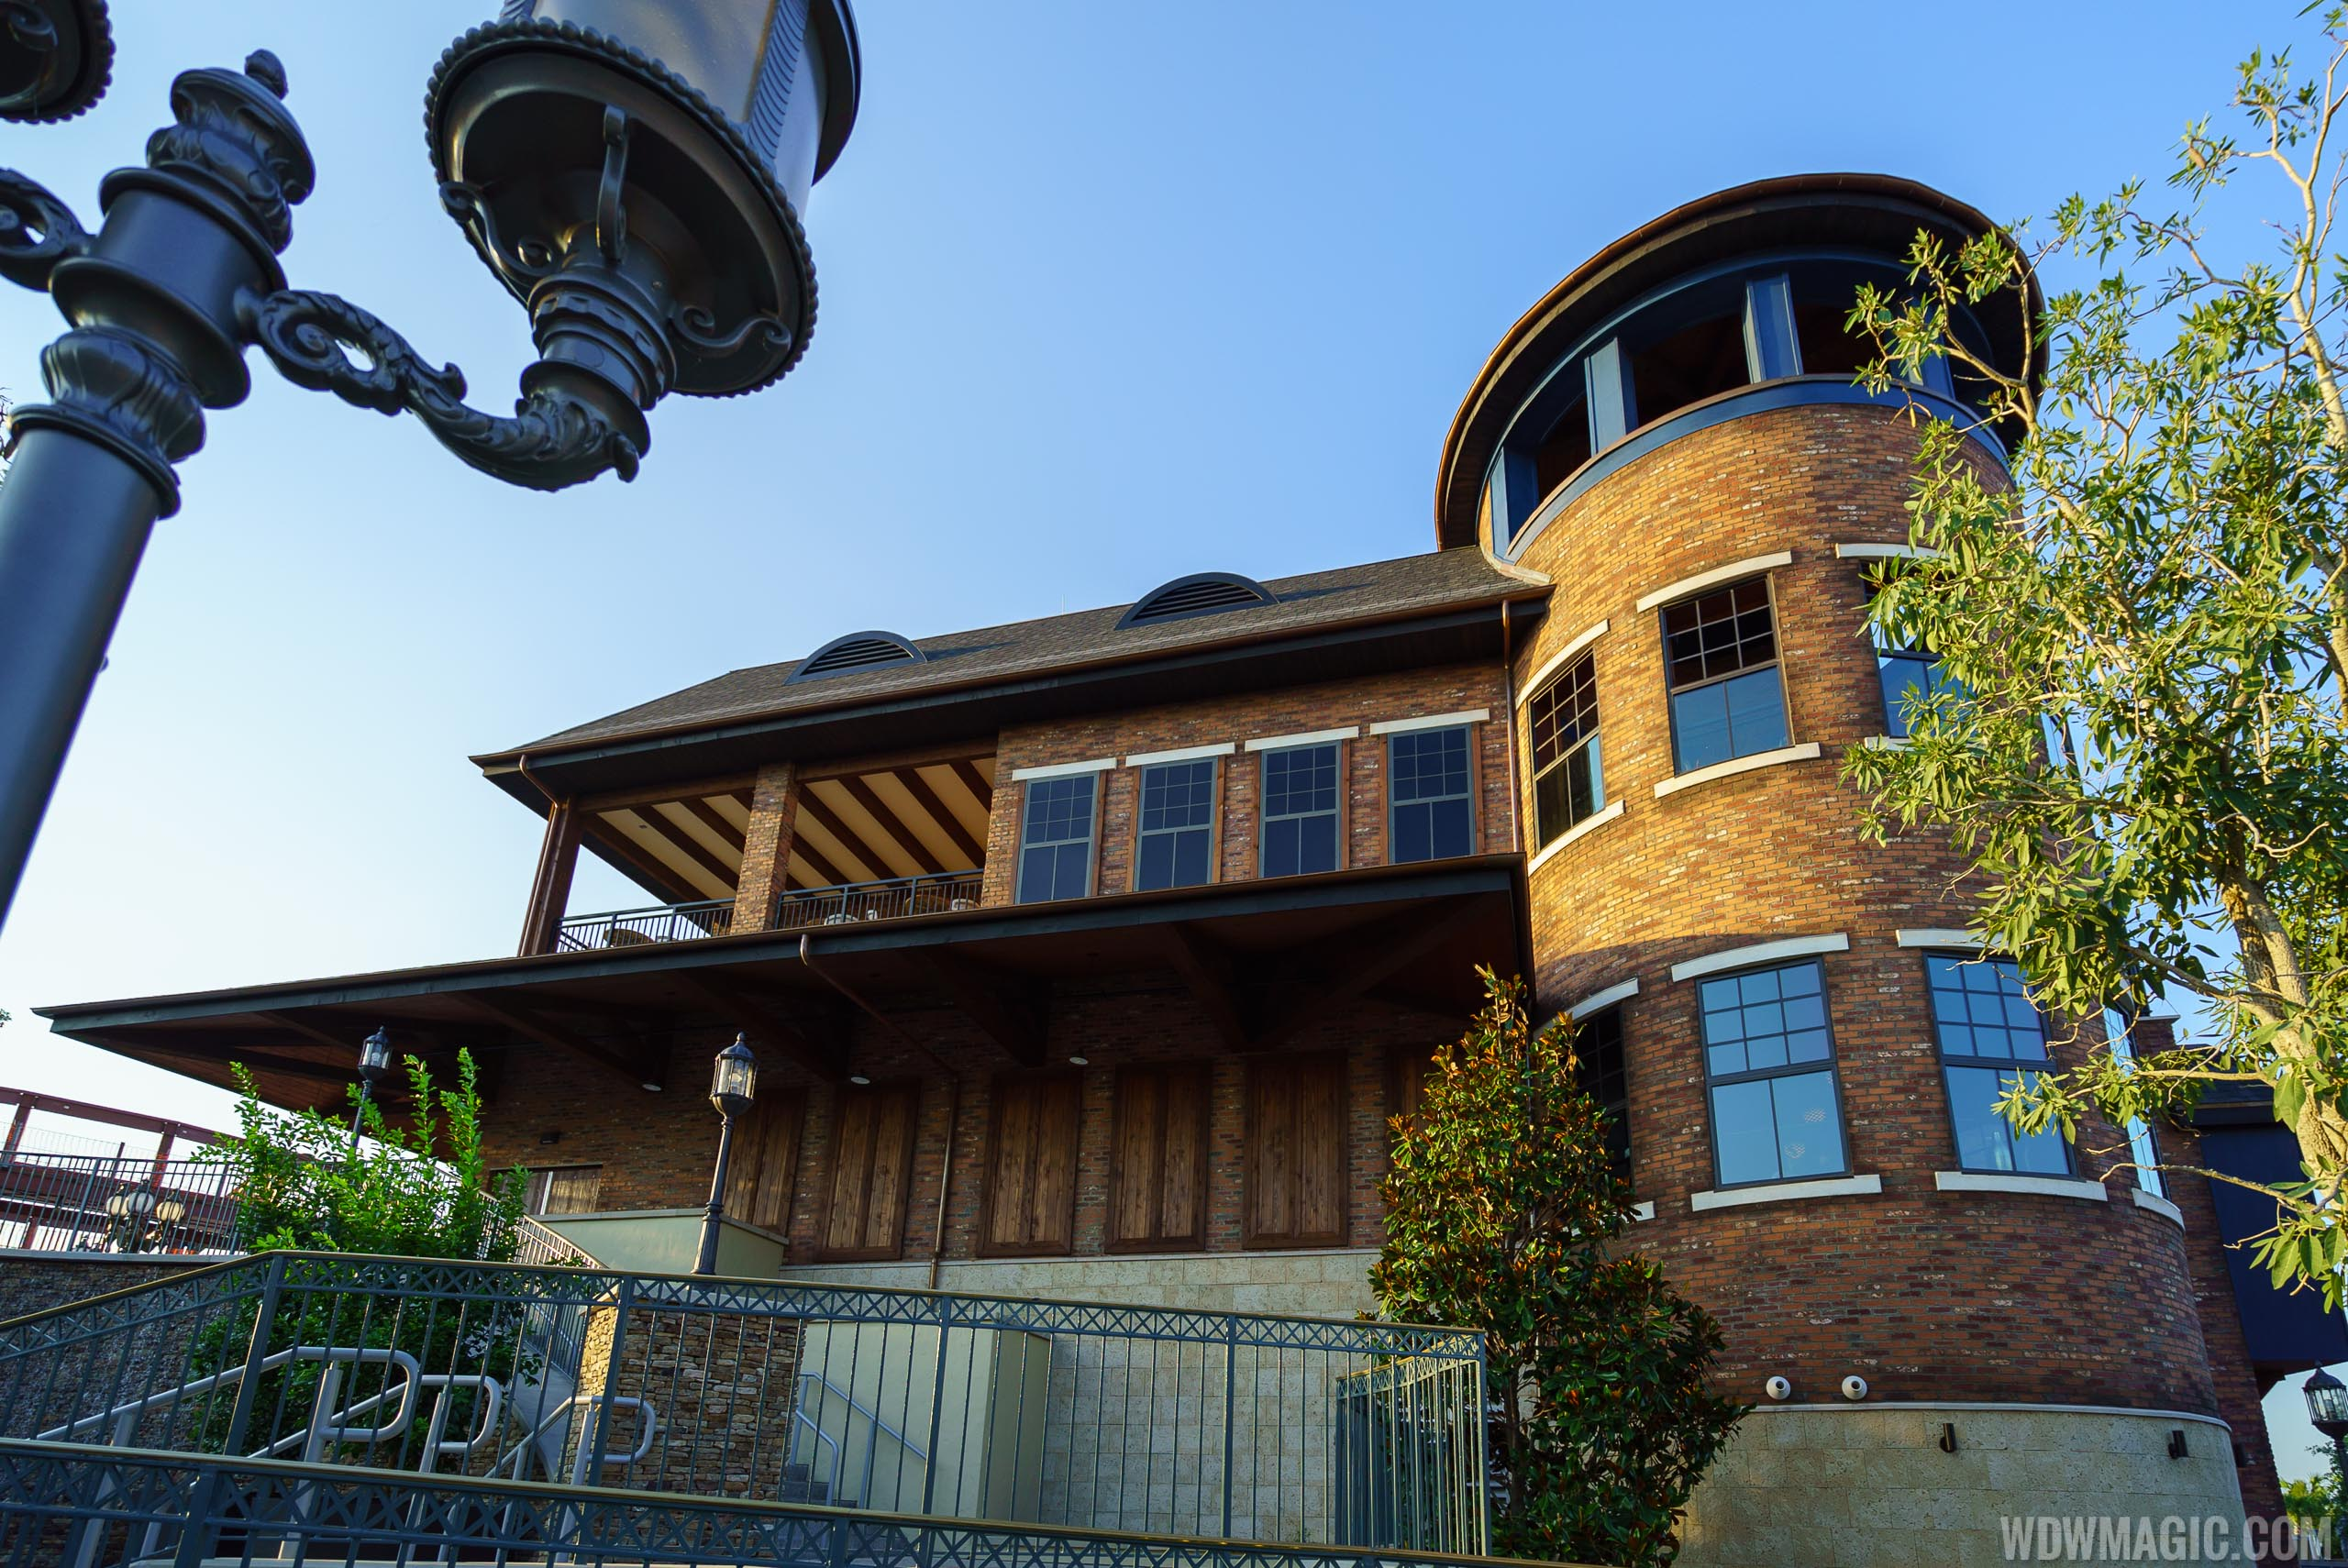 STK Orlando - Side view of exterior